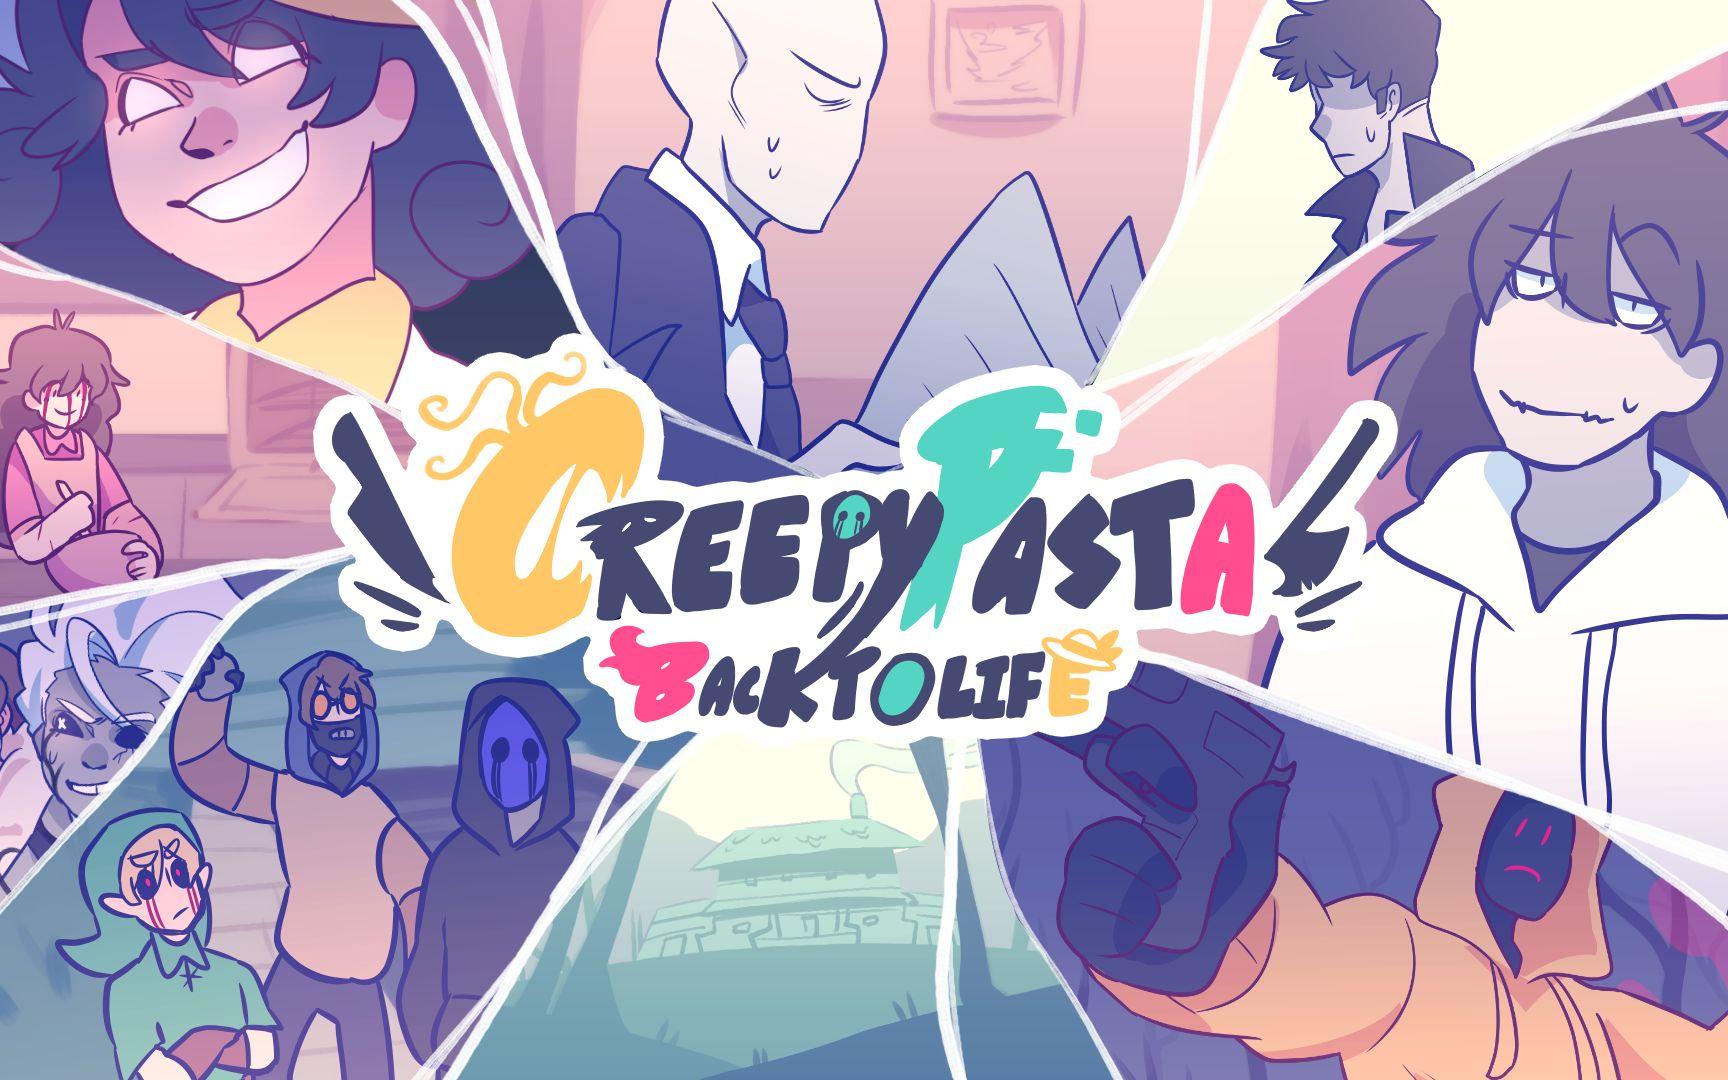 CreepyPasta 起死回生 //動畫預告//CreepyPasta BackToLife//